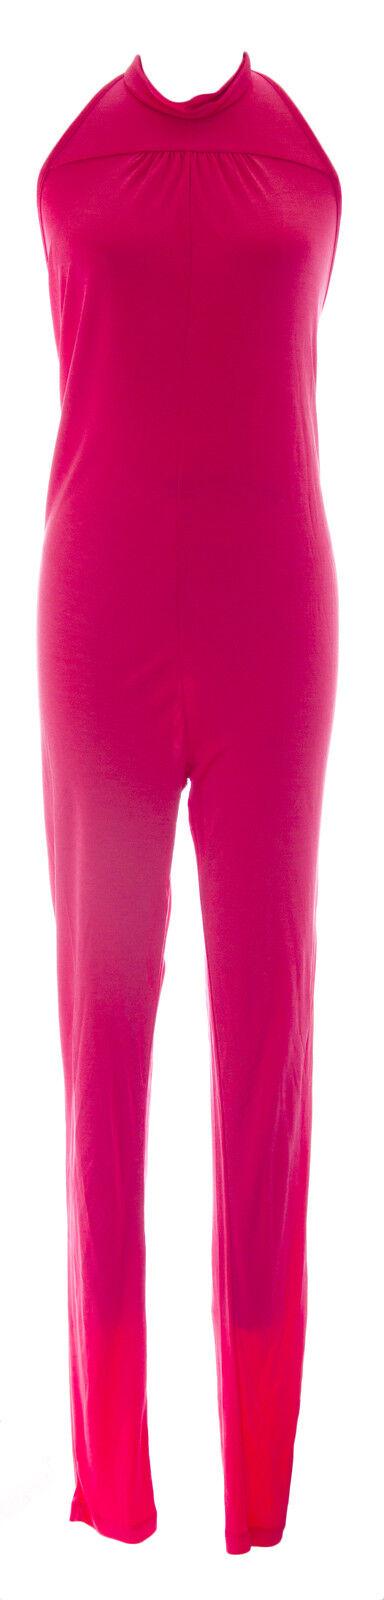 DIESEL Women's Hot Pink Jopy Tuta Halter Jumpsuit C8NI NEW